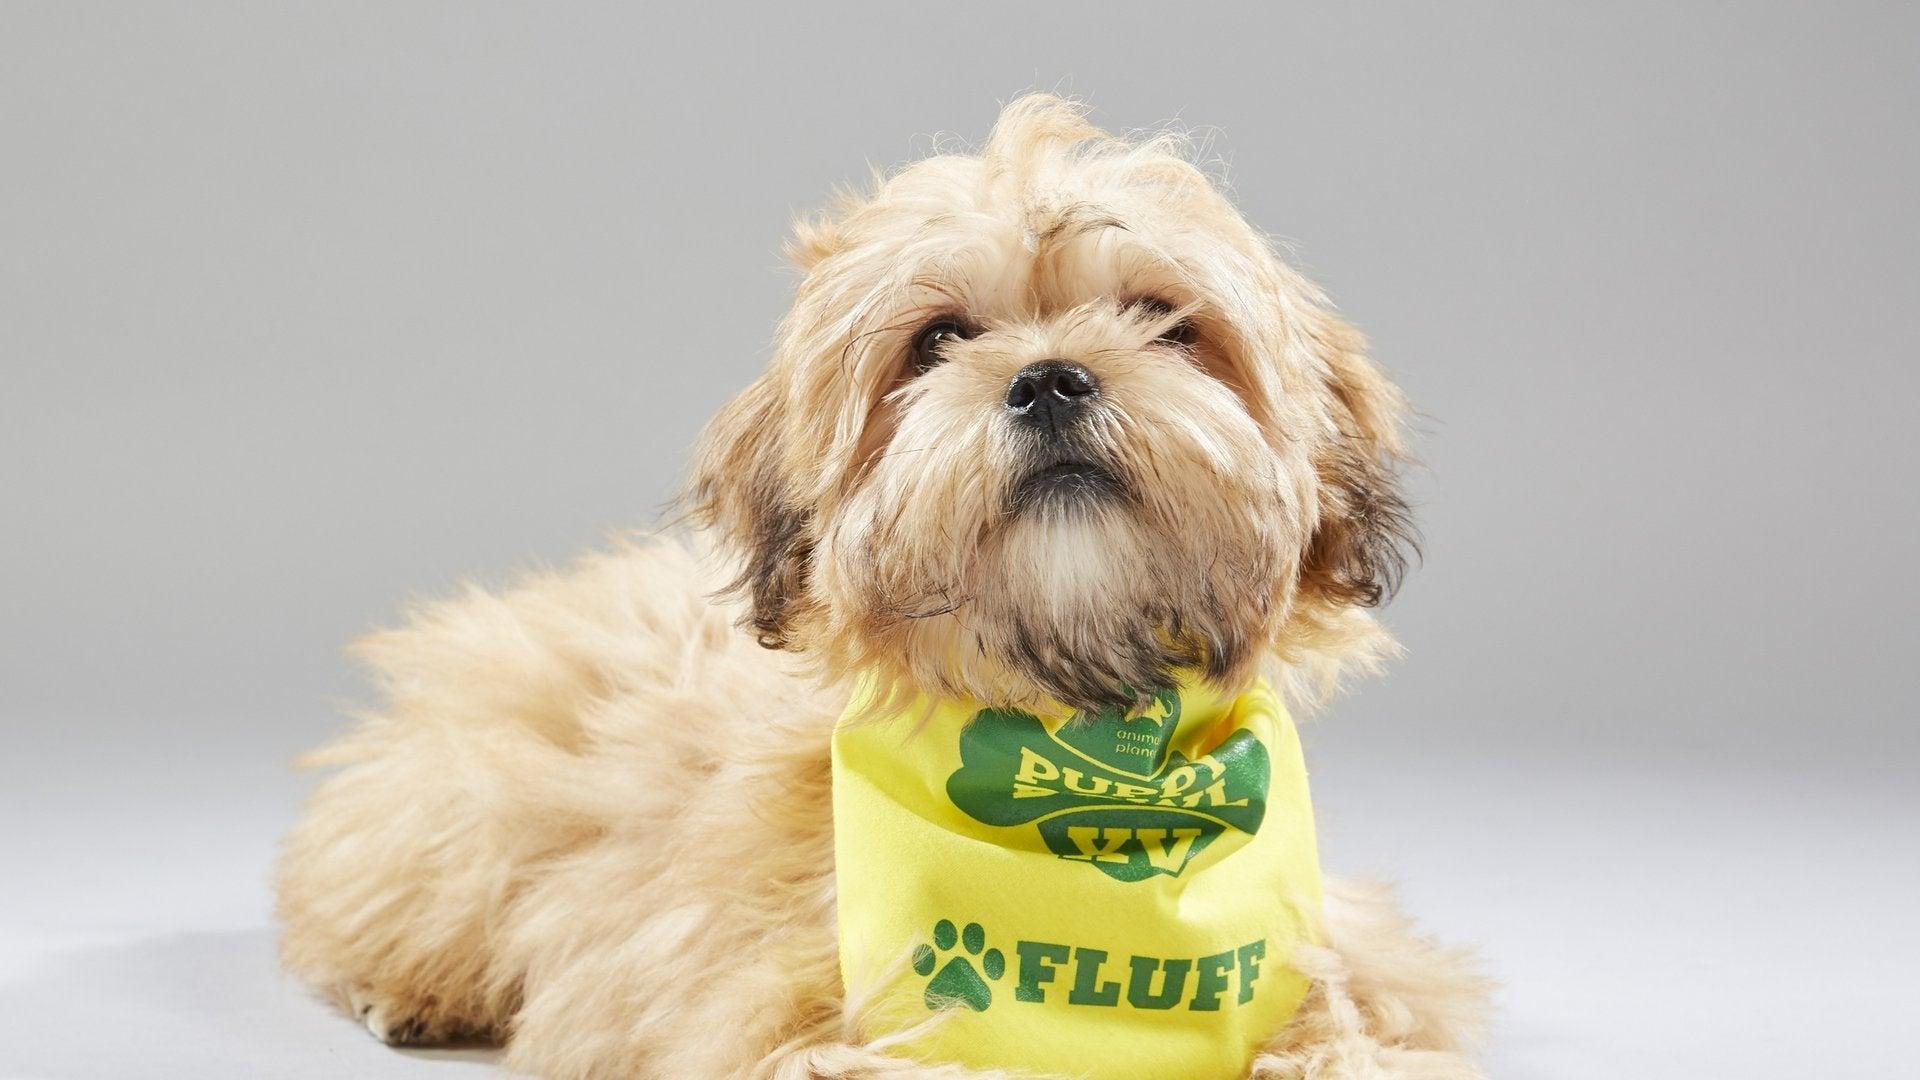 Puppy Bowl XV Presents: America's Cutest